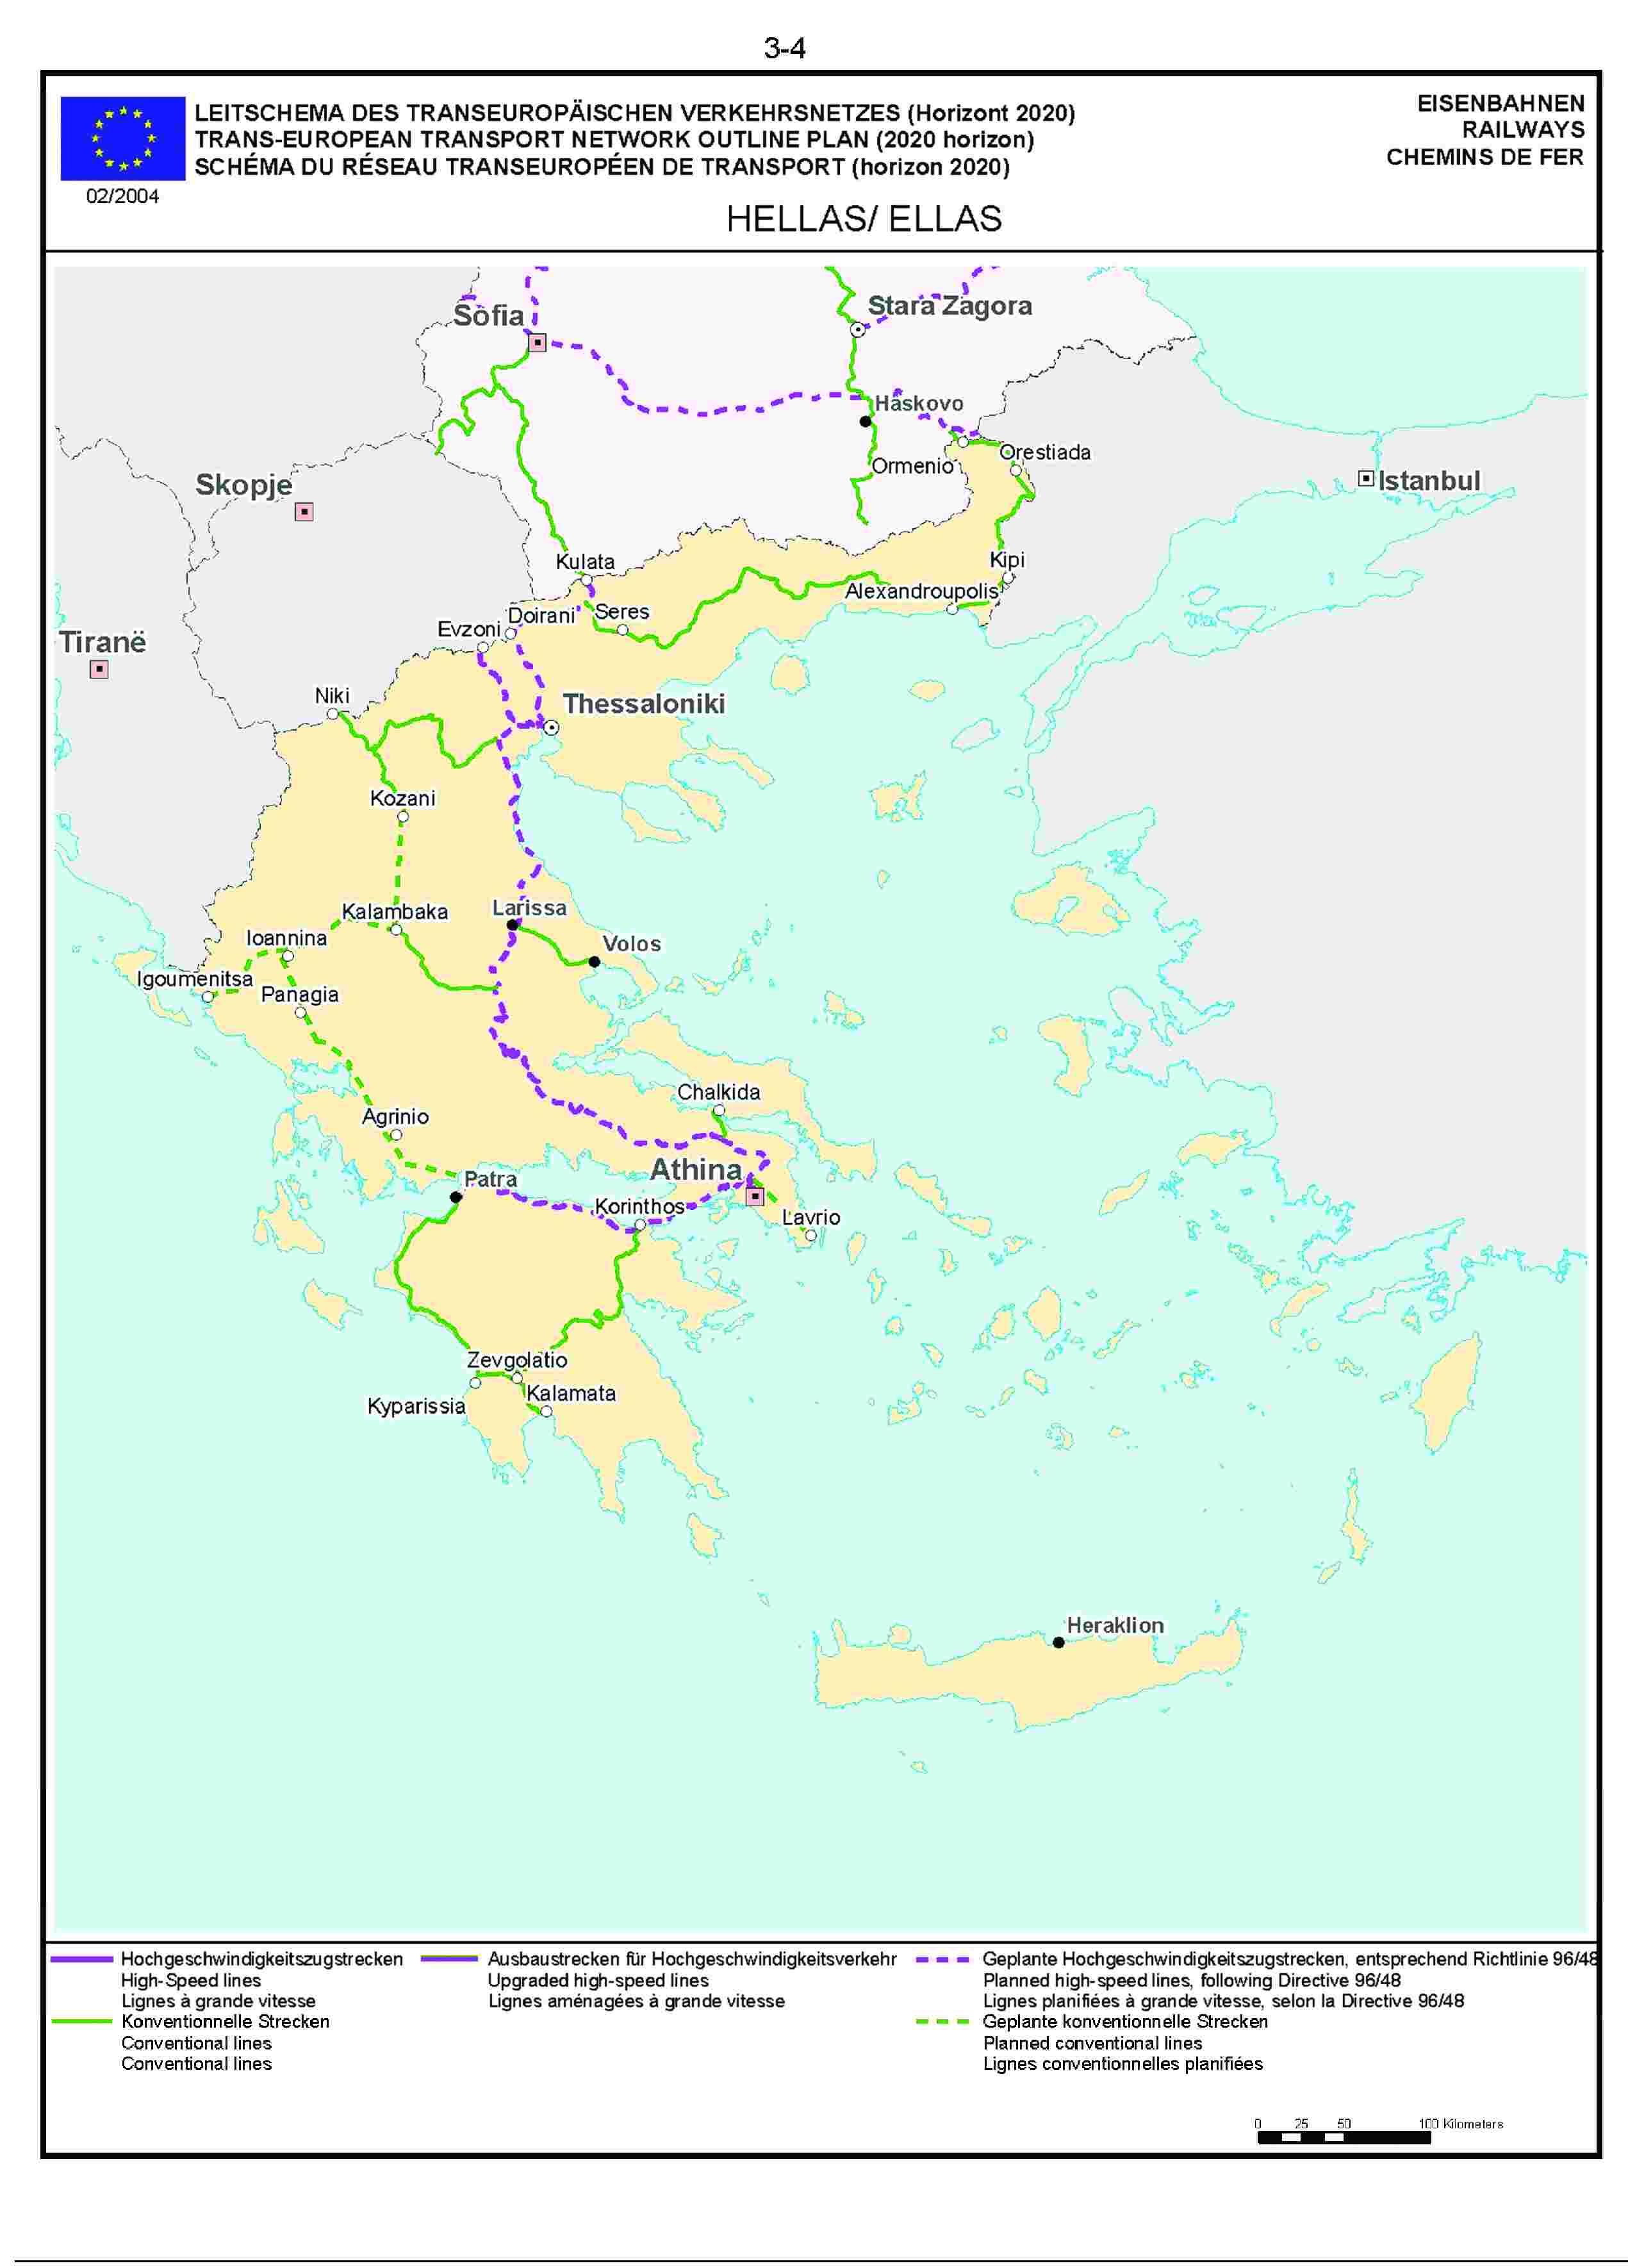 3.4LEITSCHEMA DES TRANSEUROPÄISCHEN VERKEHRSNETZES (Horizont 2020) EISENBAHNENTRANS-EUROPEAN TRANSPORT NETWORK OUTLINE PLAN (2020 horizon) RAILWAYSSCHÉMA DU RÉSEAU TRANSEUROPÉEN DE TRANSPORT (horizon 2020) CHEMINS DE FER02/2004HELLAS/ELLAS